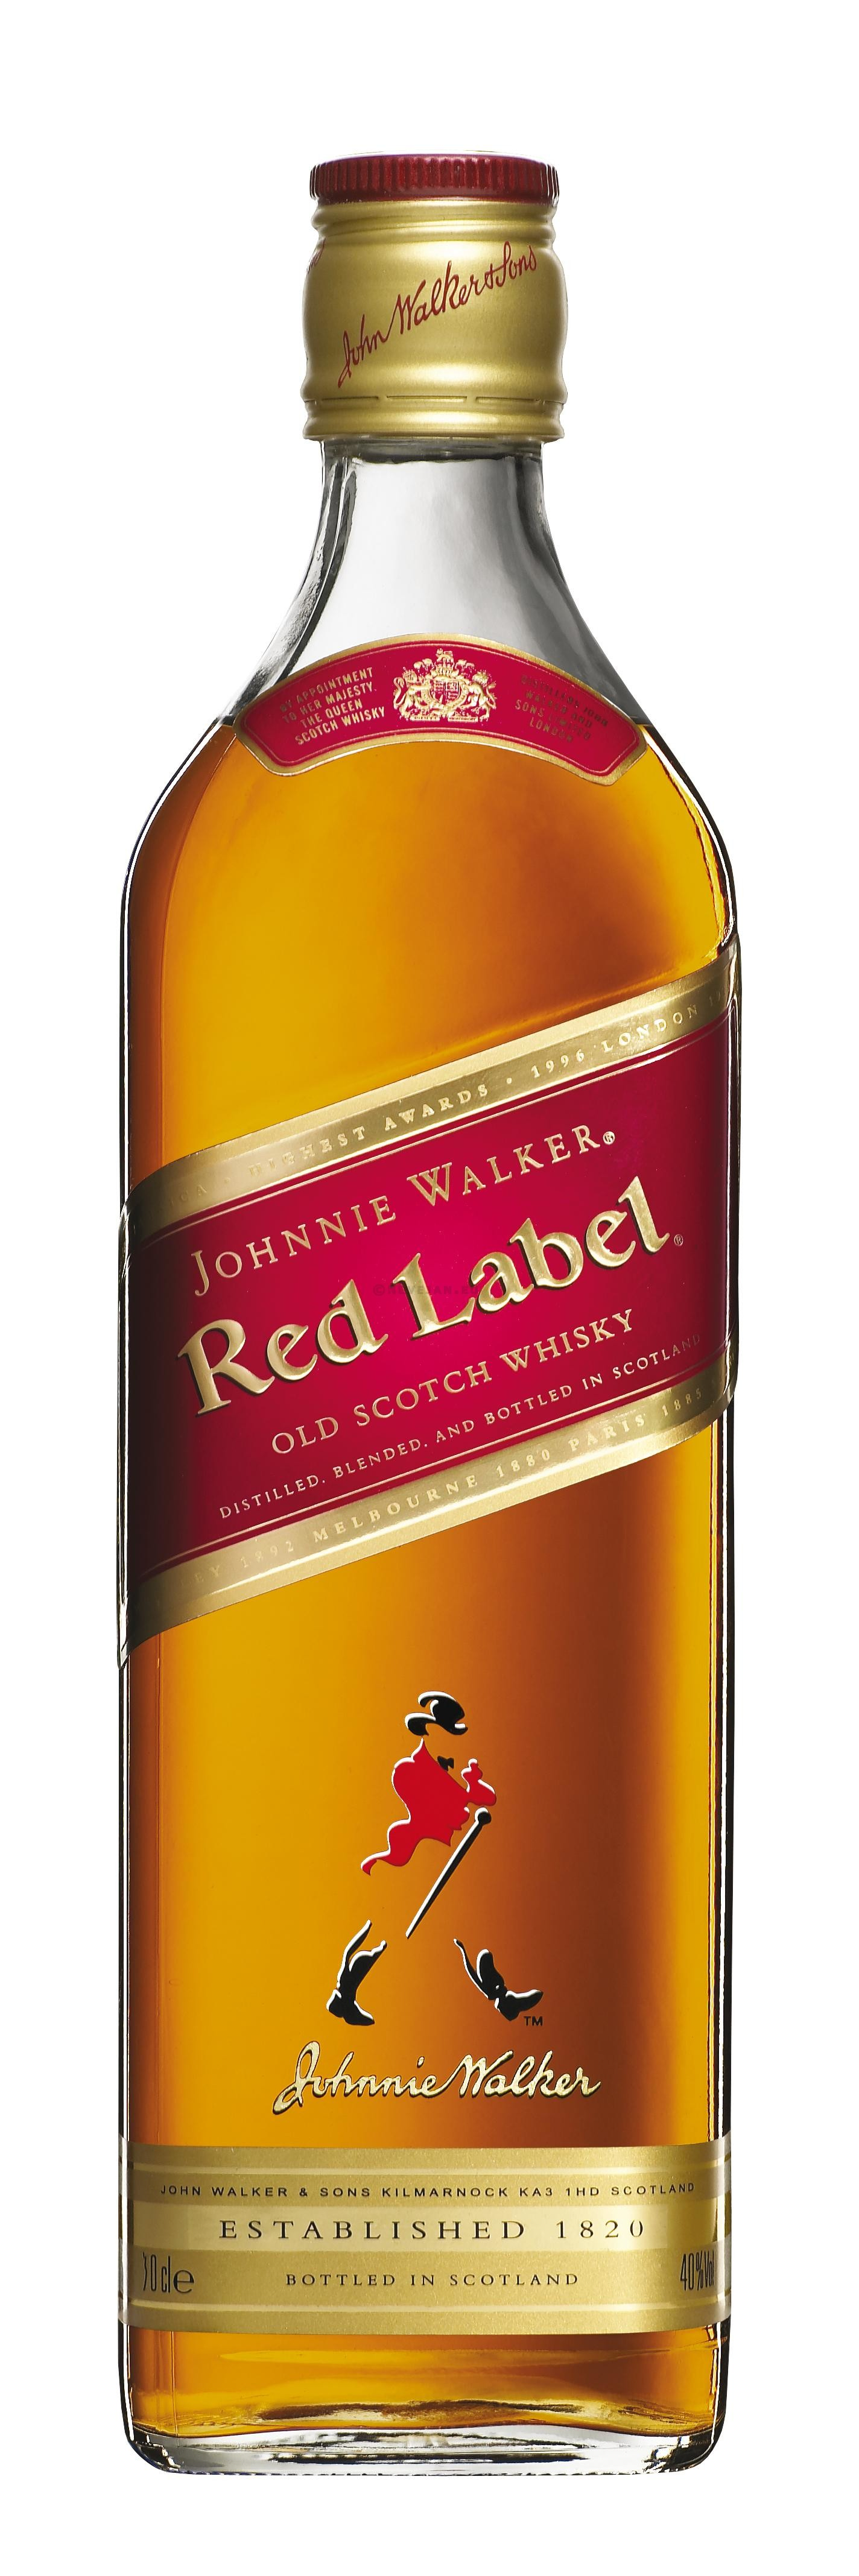 Johnnie Walker Red Label 70cl 40% Scotch Whisky